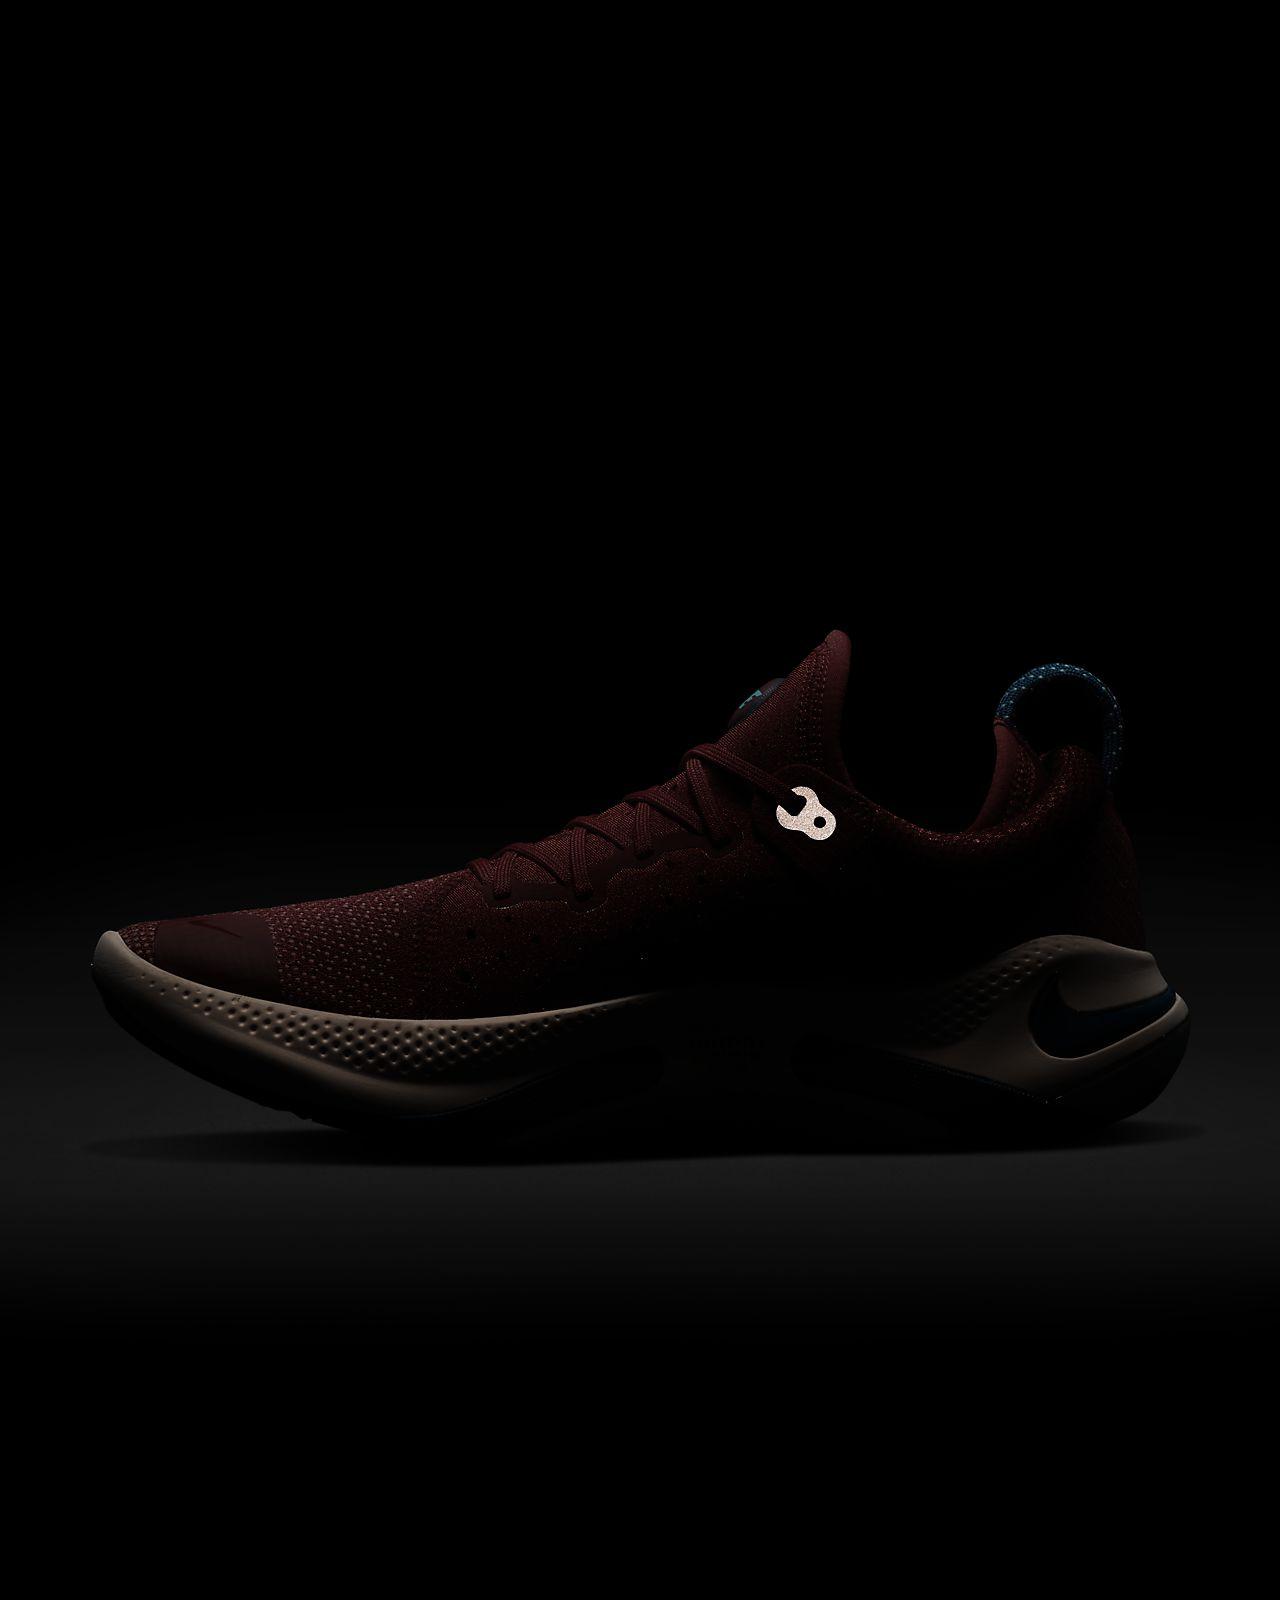 Nike's Self Lacing HyperAdapt Sneakers Are Returning In 2019